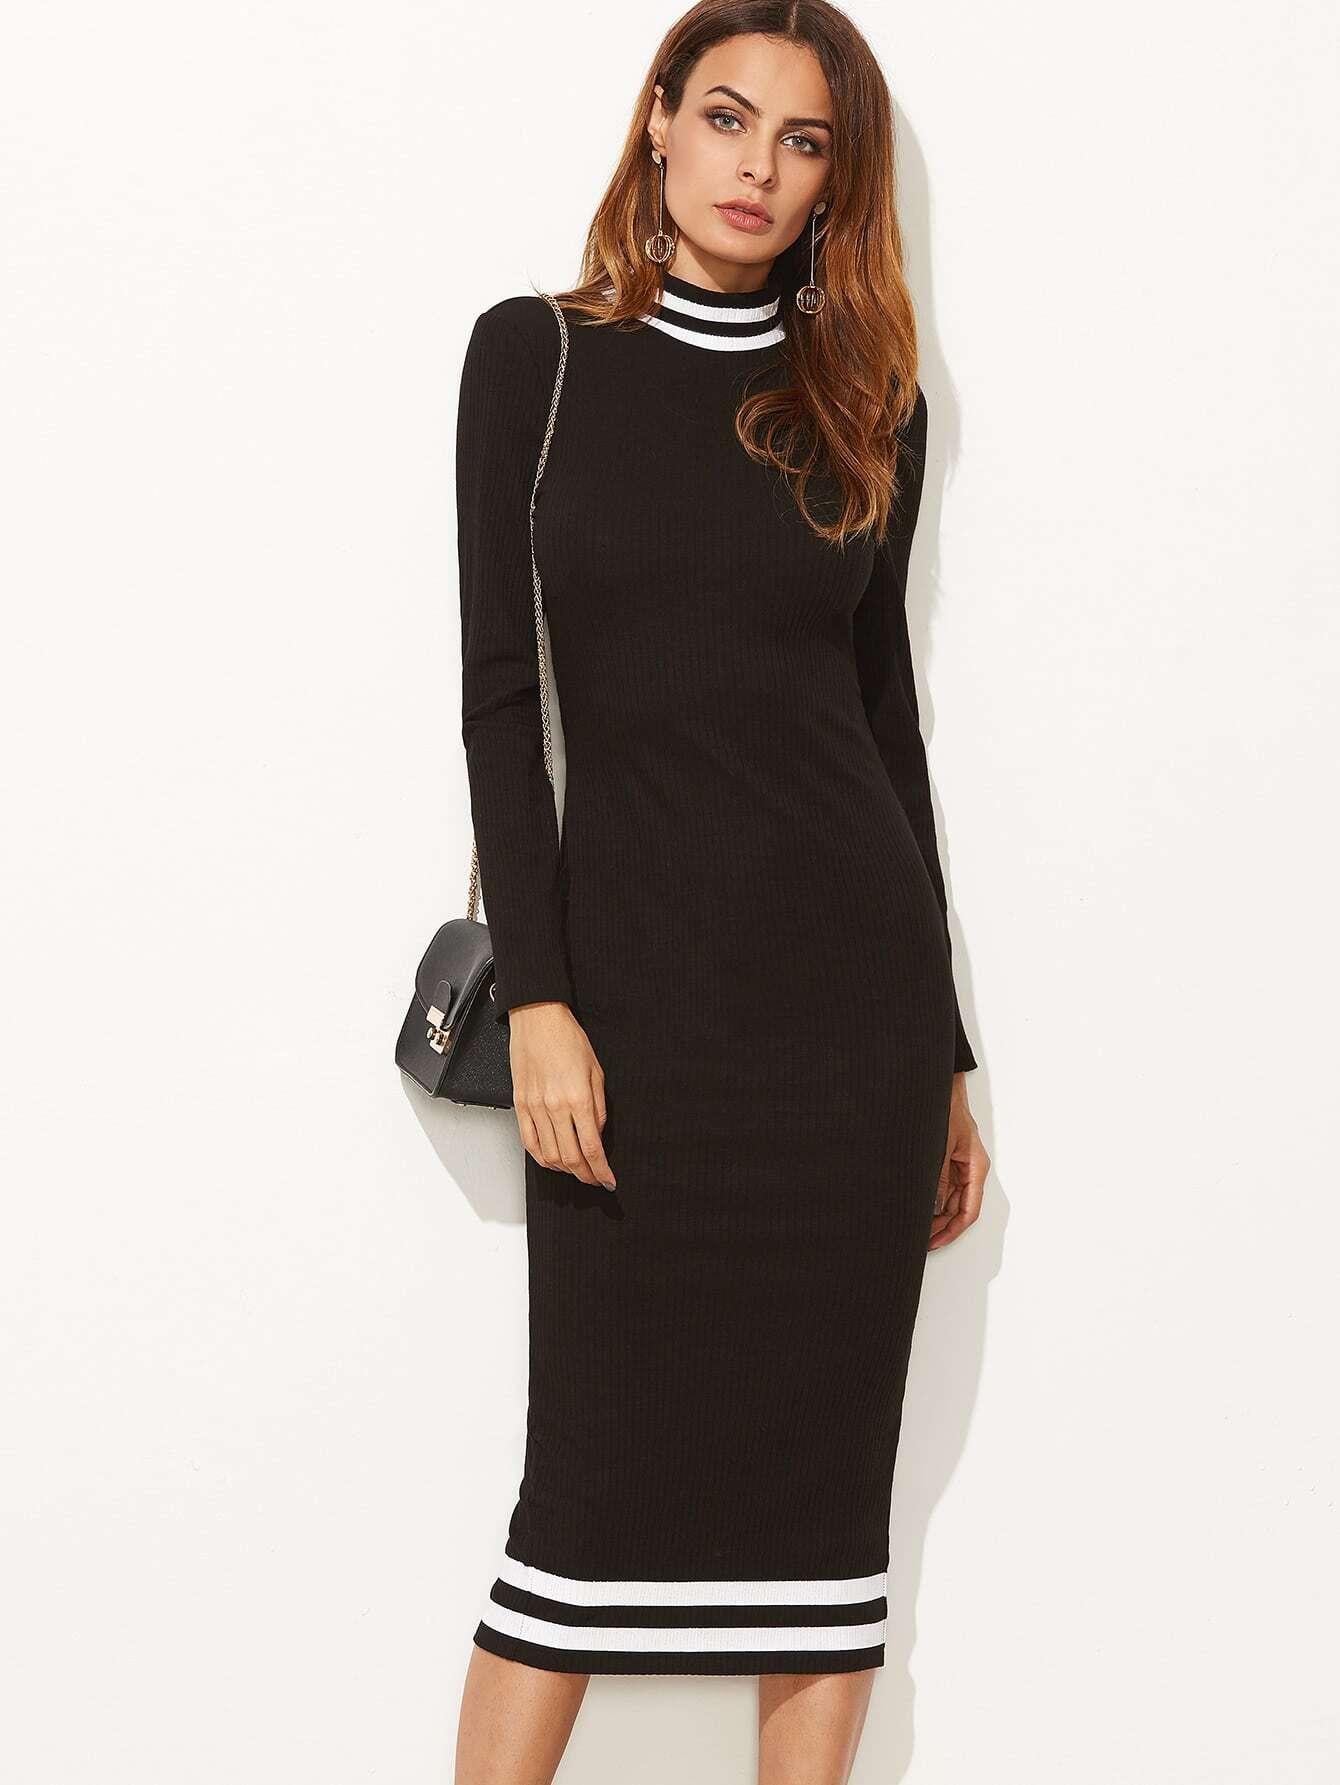 Black Ribbed Knit Striped Trim Slit Back Pencil Dress dress161031703